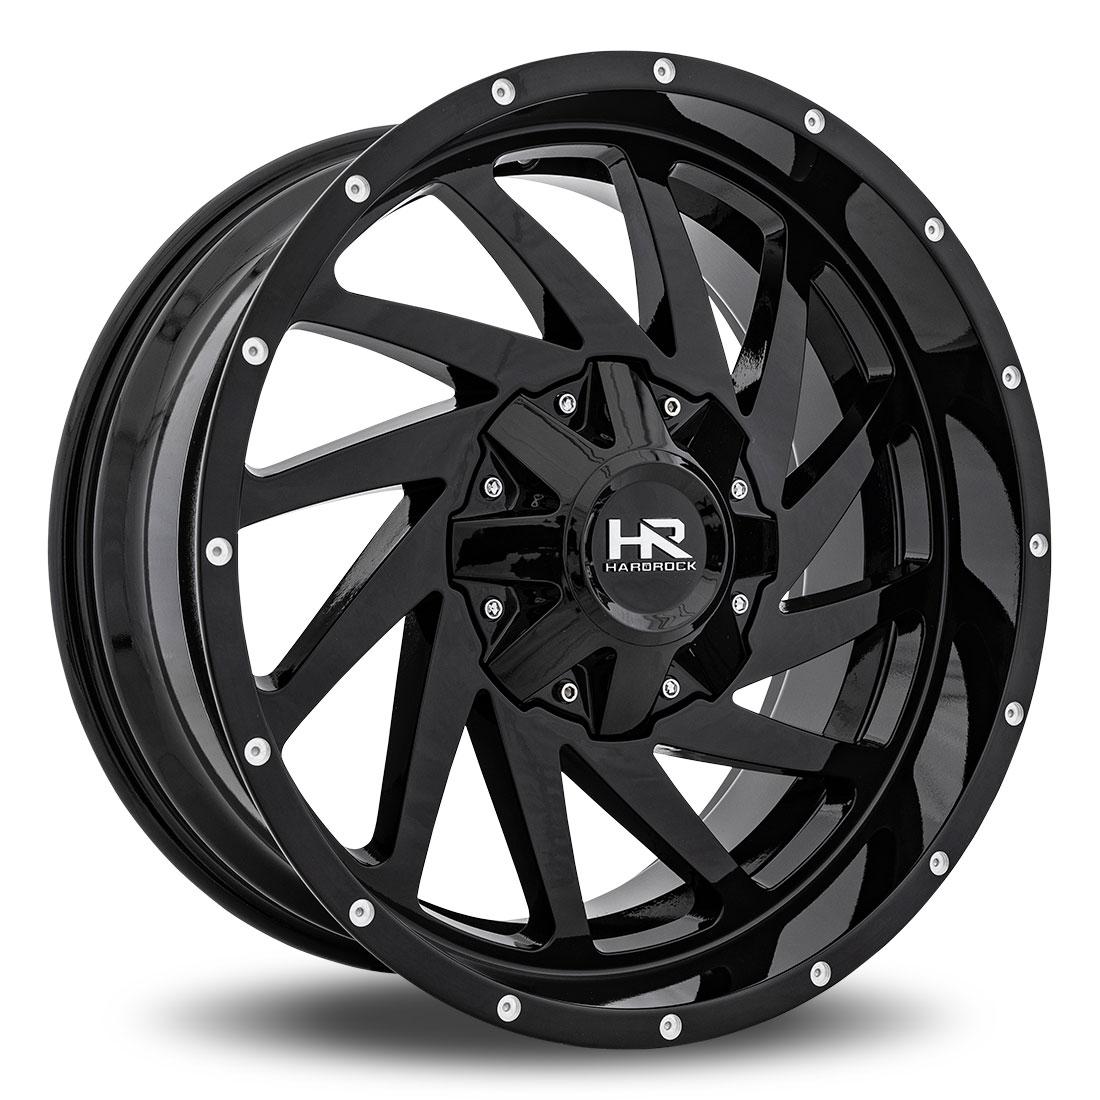 Hardrock Offroad Wheels H704 Crusher  Black Dimples 20x9